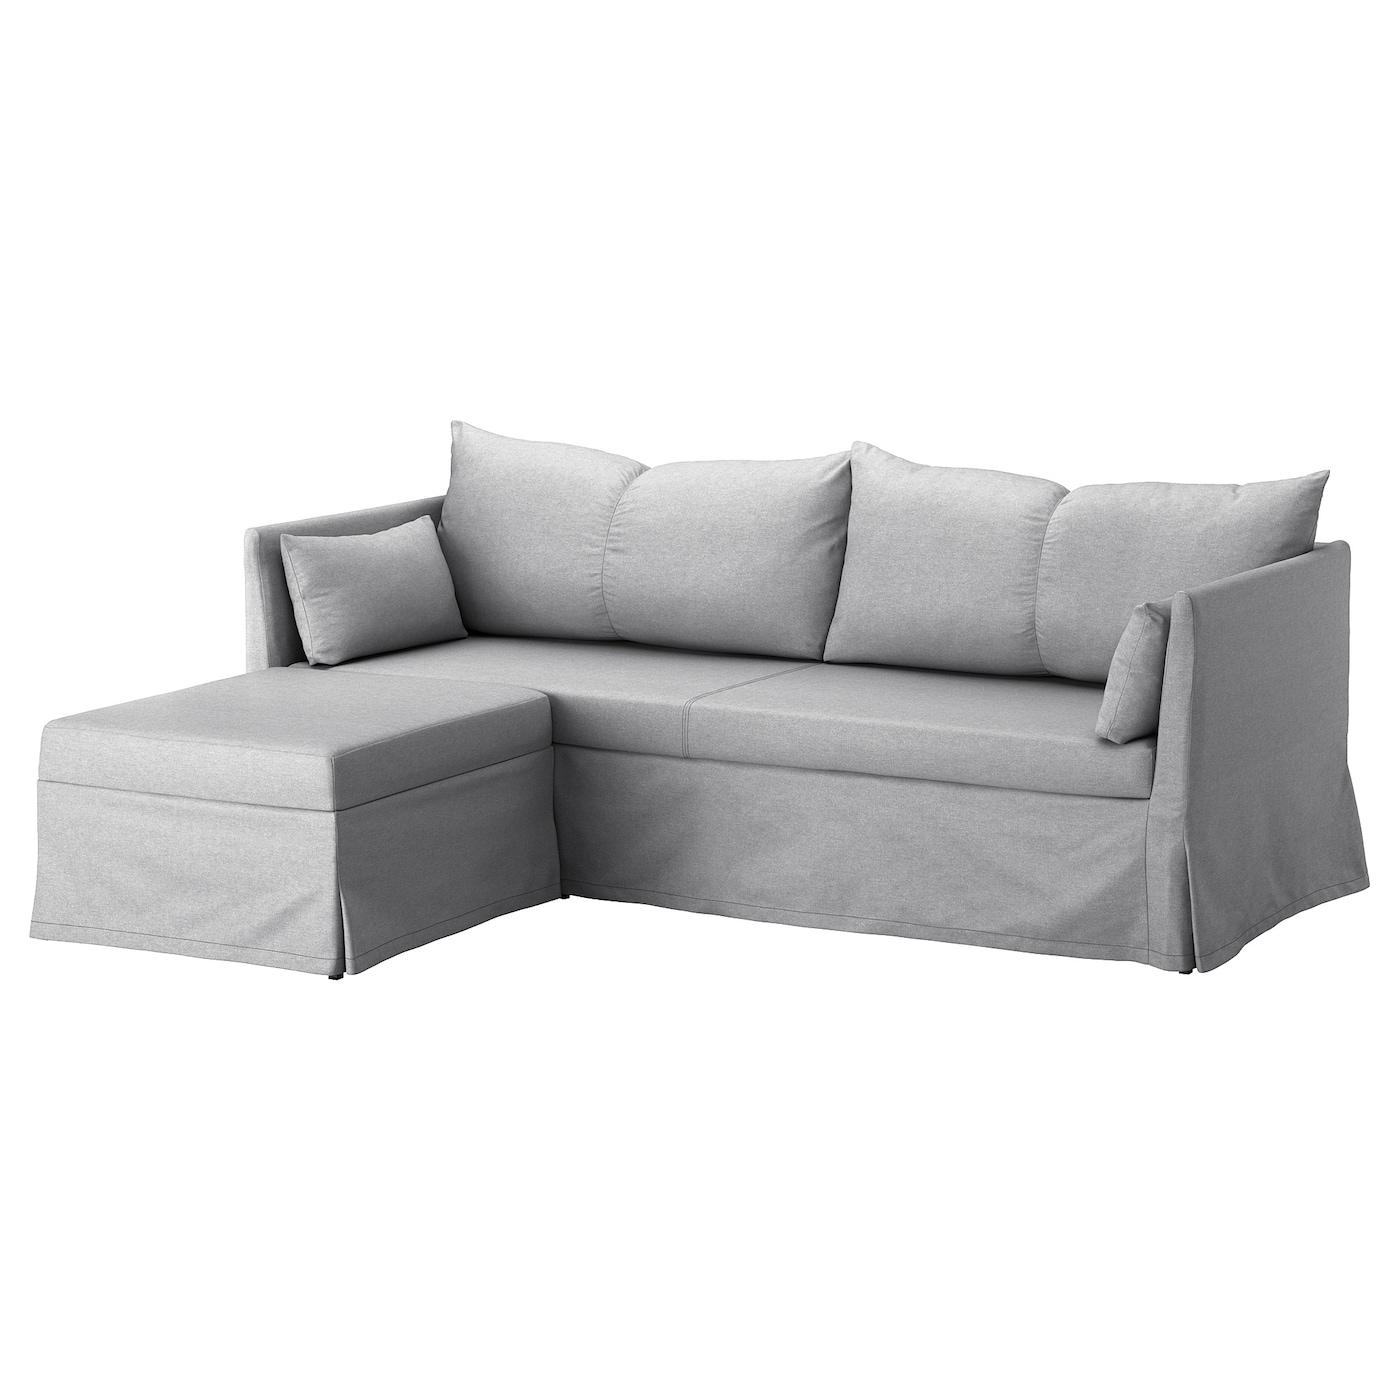 Sandbacken Sleeper Sectional 3 Seat